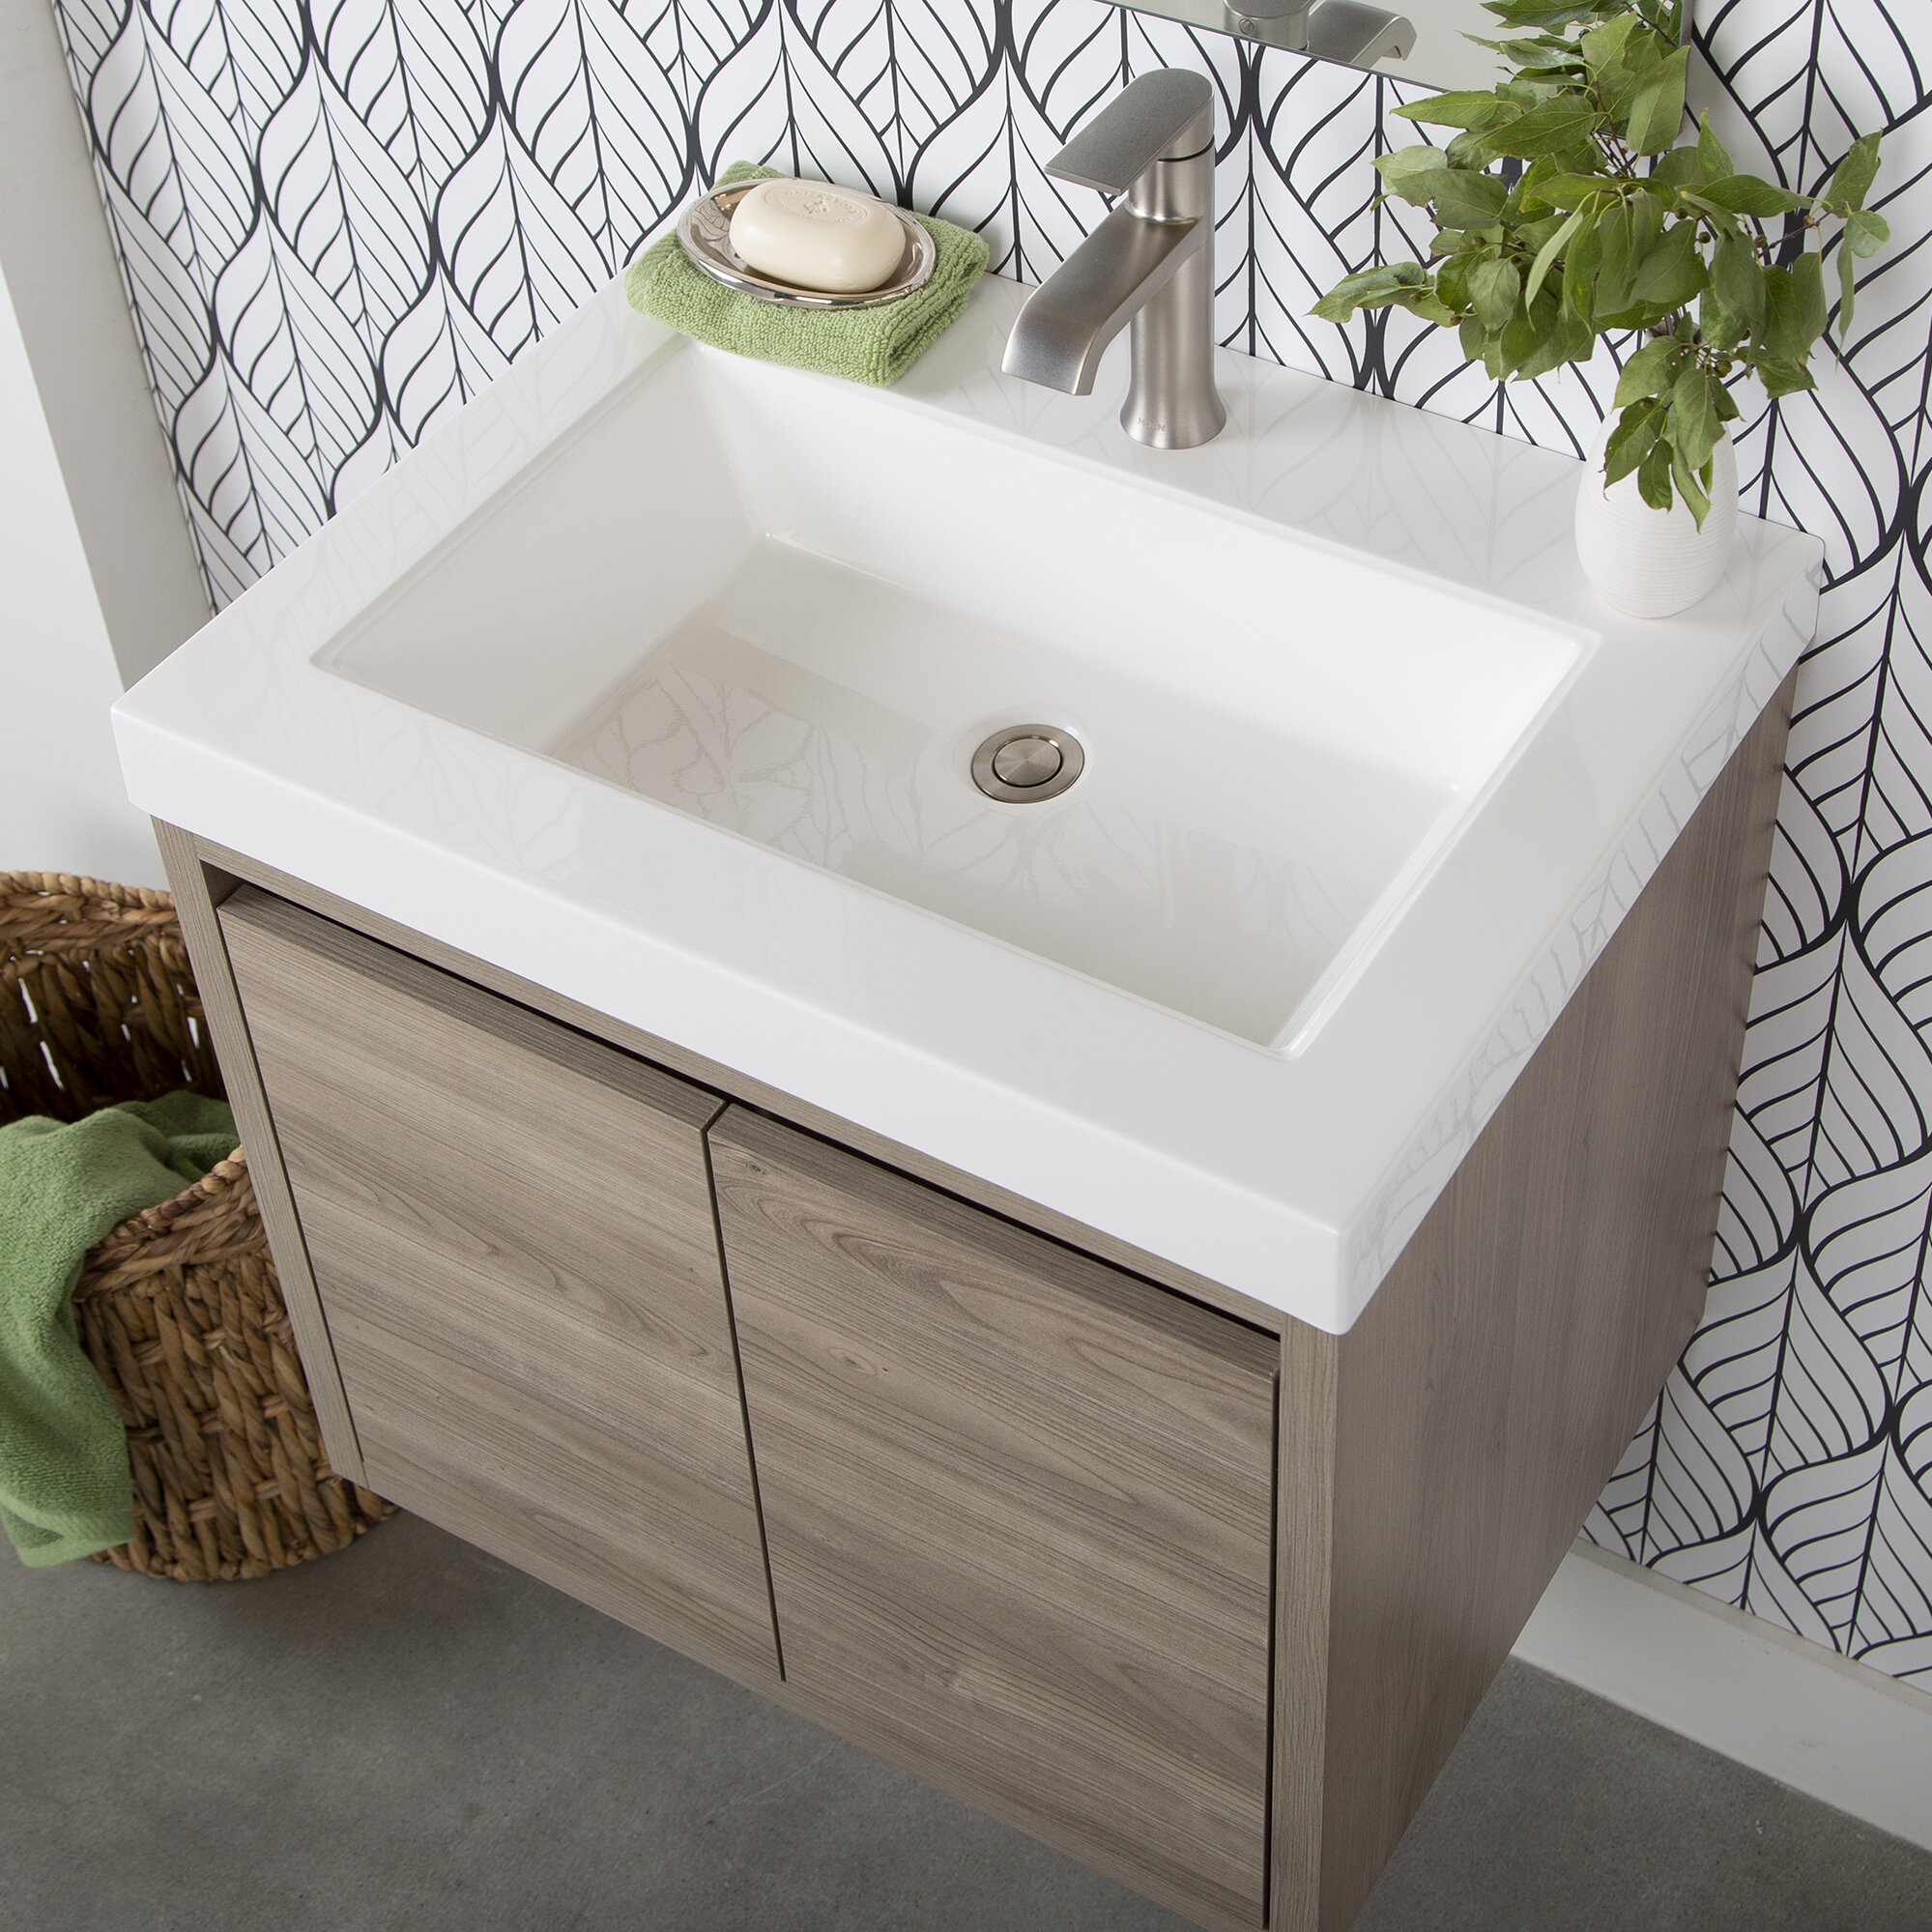 Modern Contemporary Bathroom Vanities You Ll Love In 2020 Wayfair